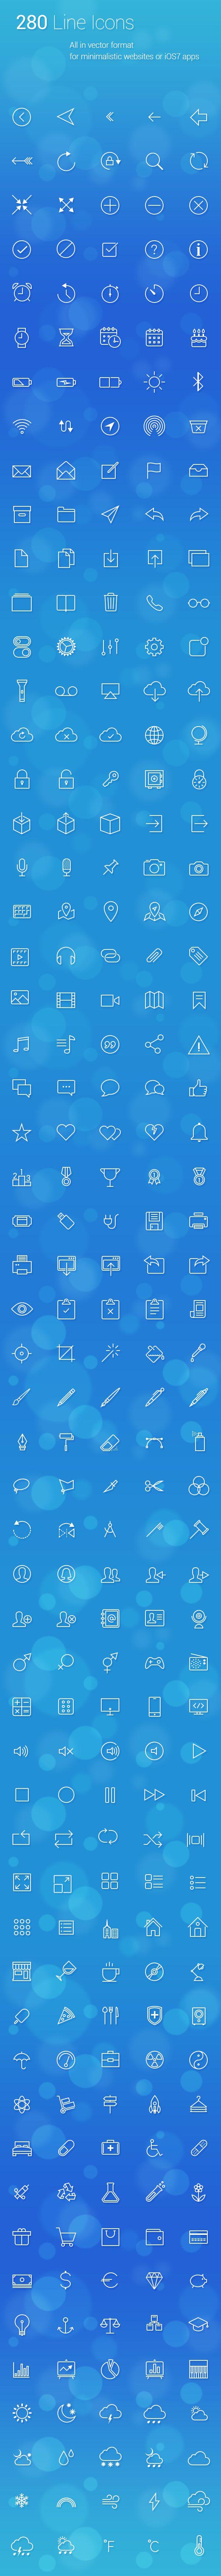 280 uniquely designed vector line icons  https://gumroad.com/l/orbG